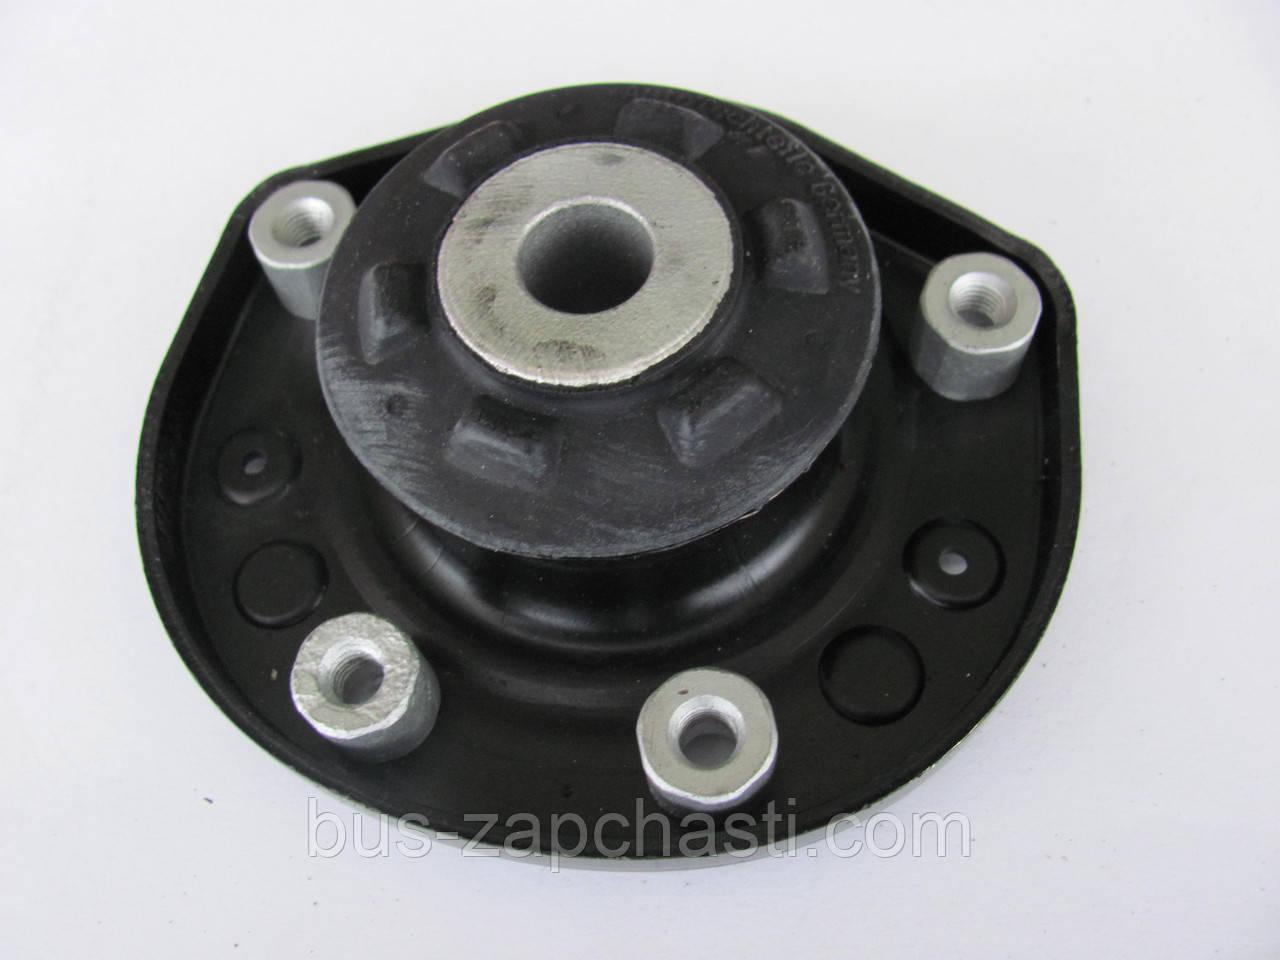 Подушка переднего амортизатора на MB Sprinter 906, VW Crafter 2006→ Rotweiss (Турция) RW32053